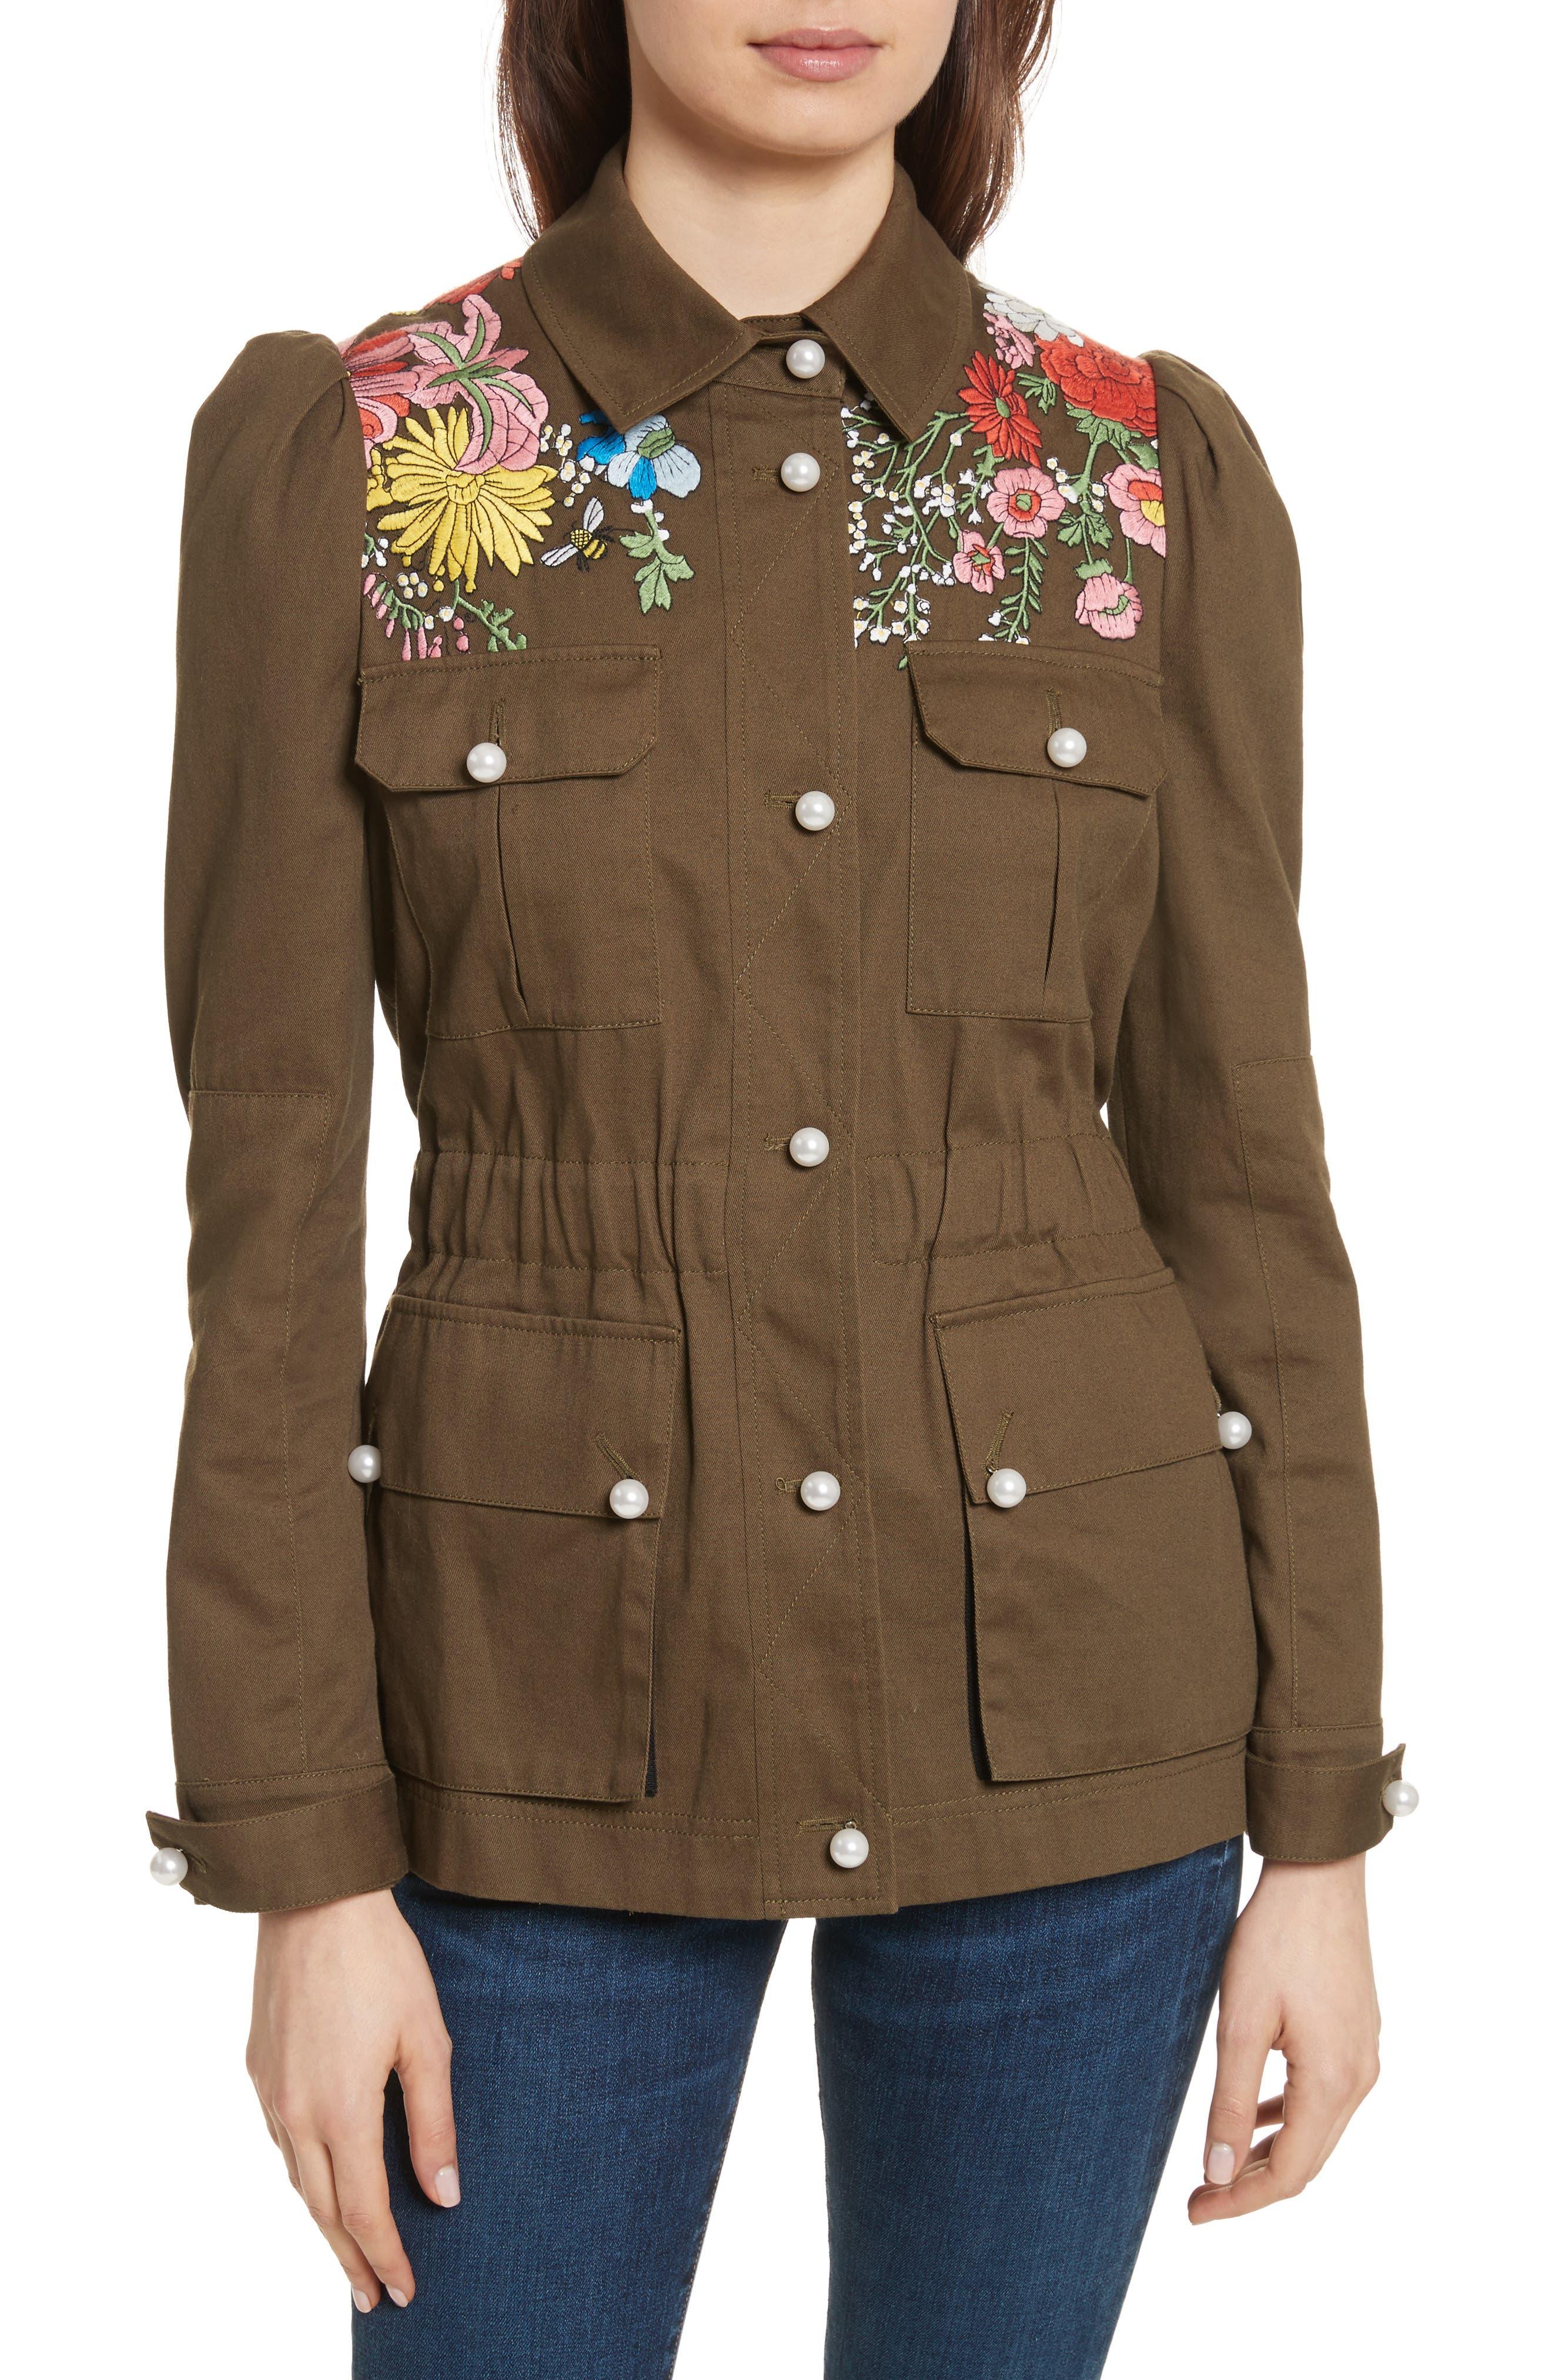 Main Image - Veronica Beard Huxley Floral Embroidered Safari Jacket